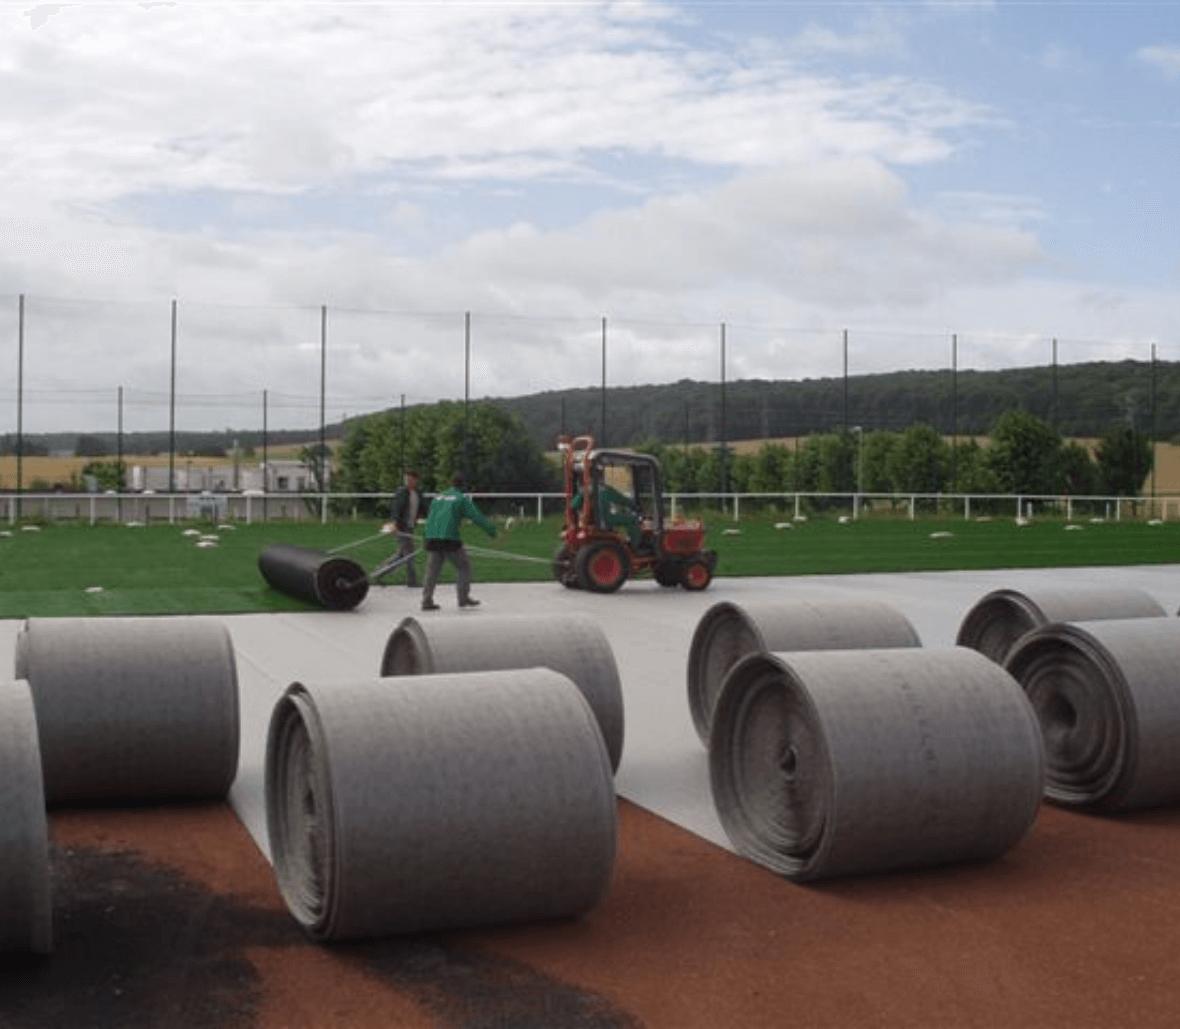 Installation of EnkaFlex_shockpad & drainage system for sportsfields_copyrights Low & Bonar_Enka Solutions